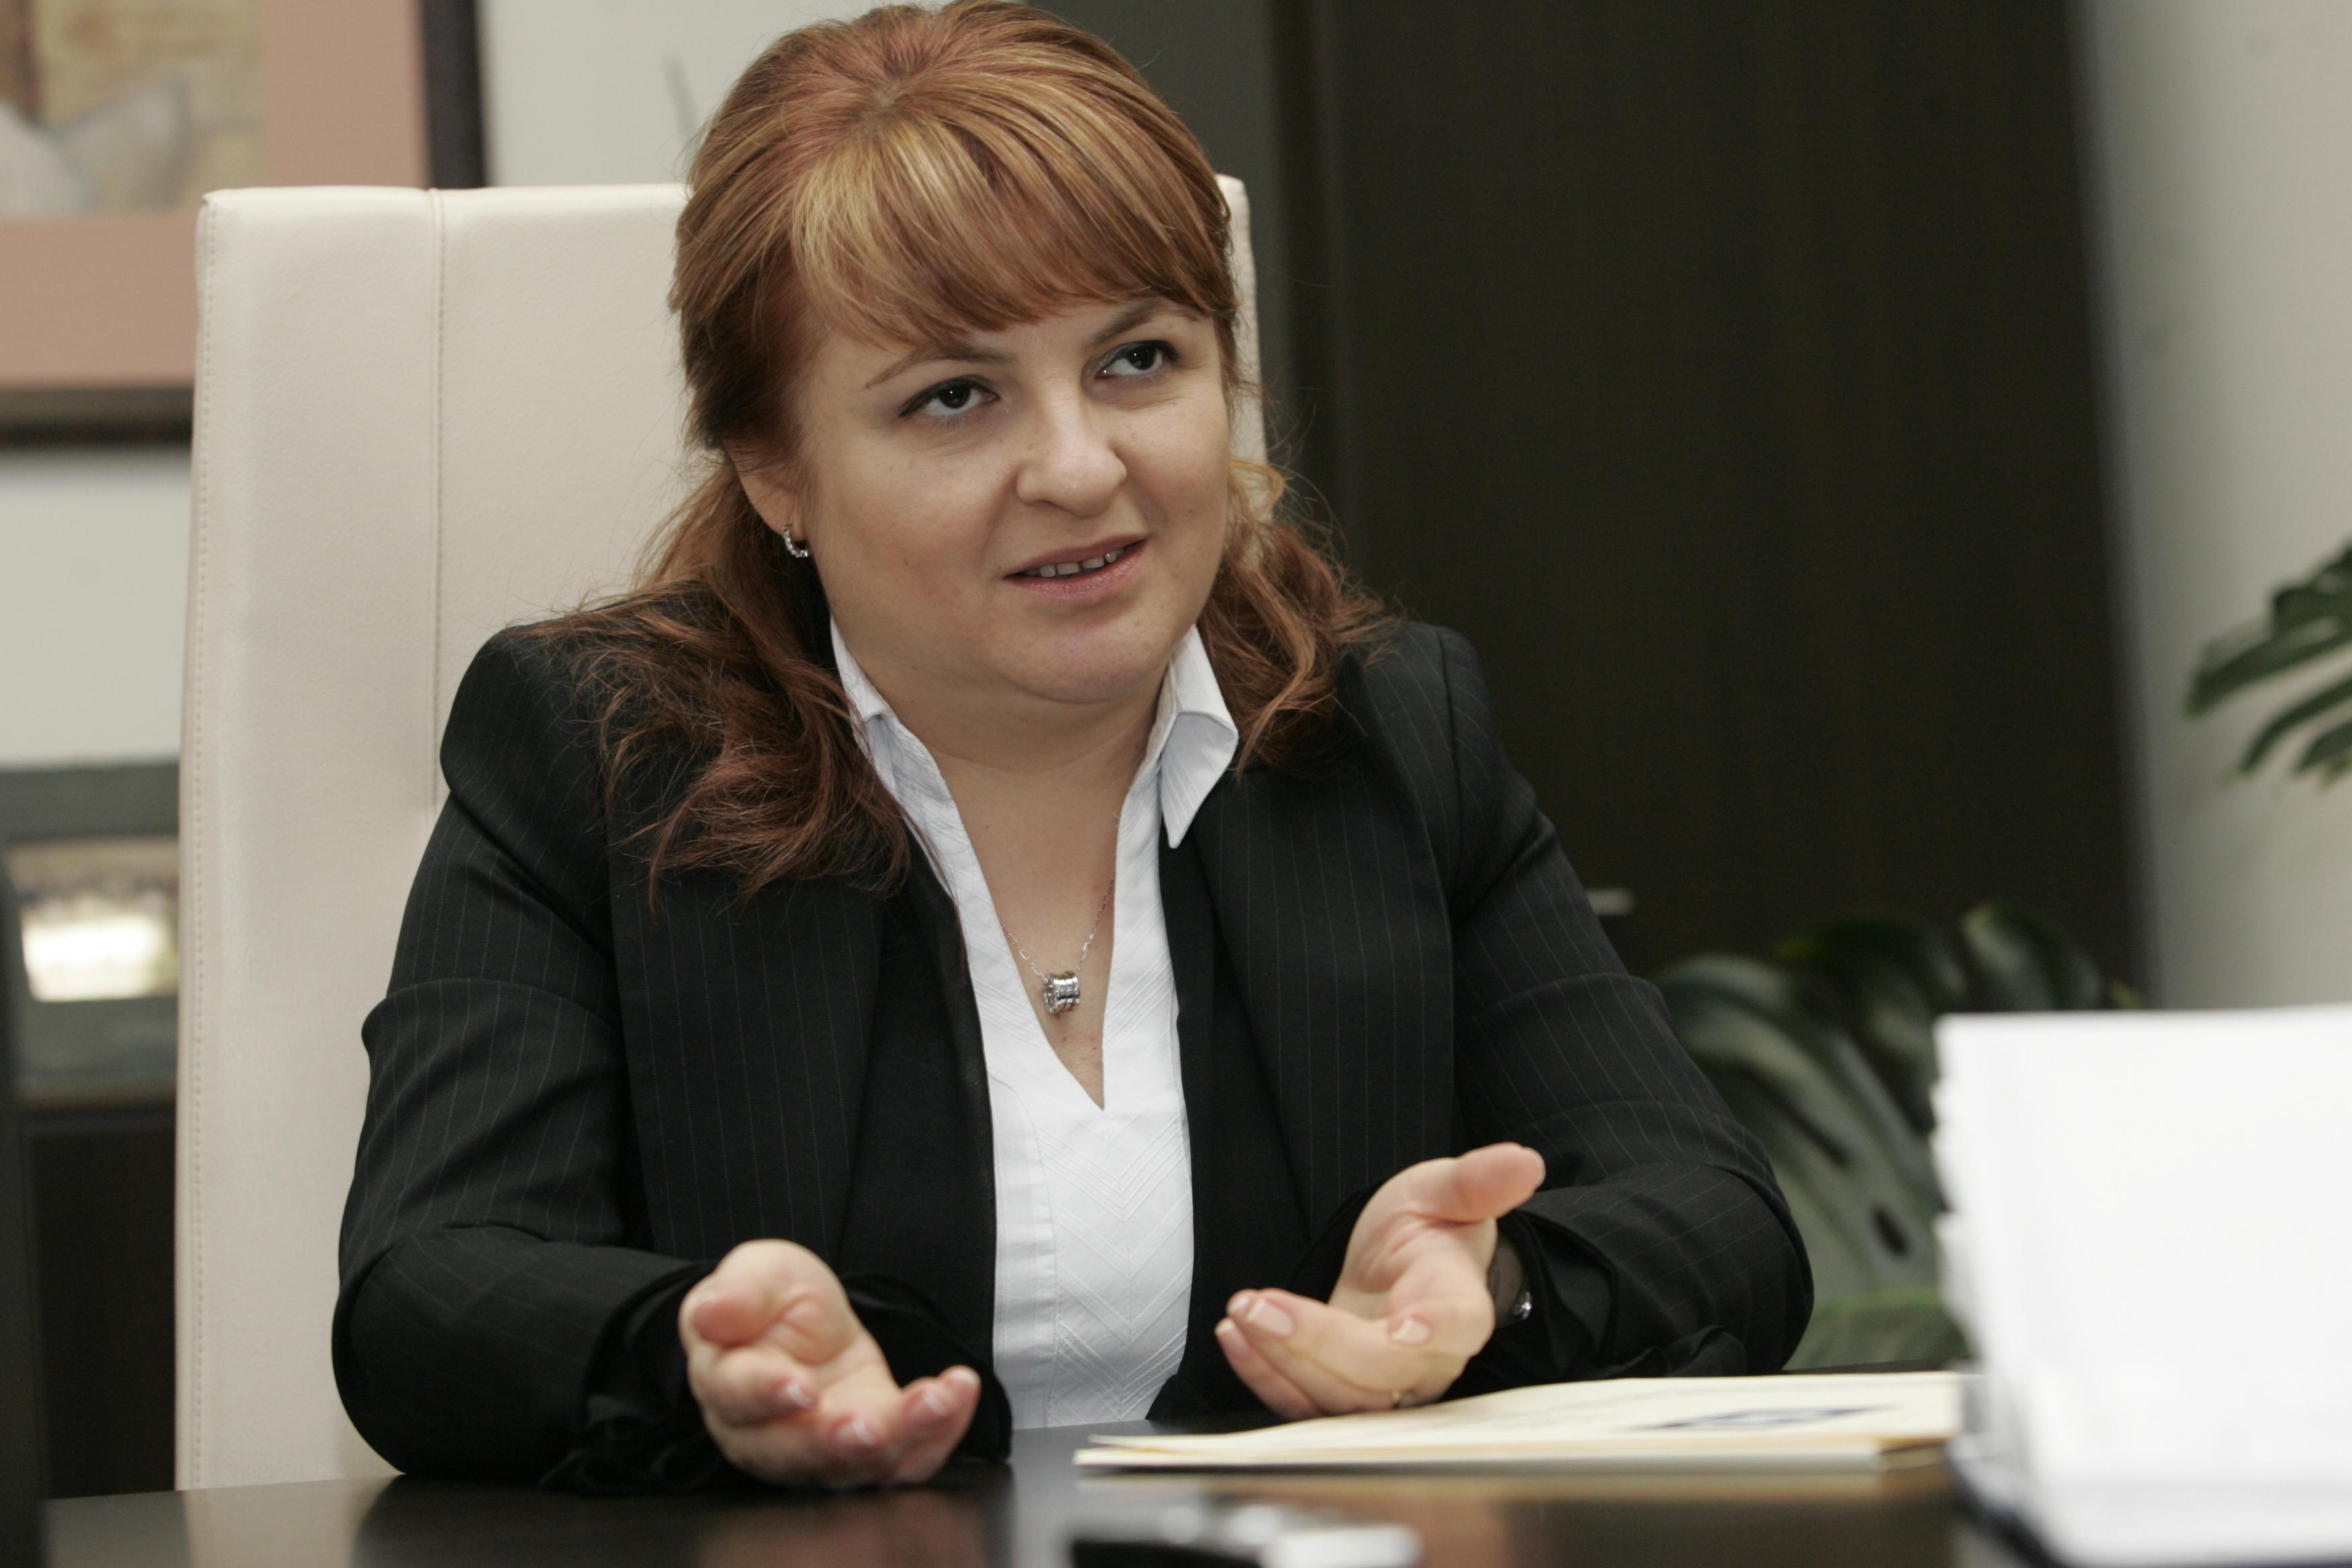 Depozitarul Central distribuie dividendele de 34 milioane de lei ale SIF Moldova